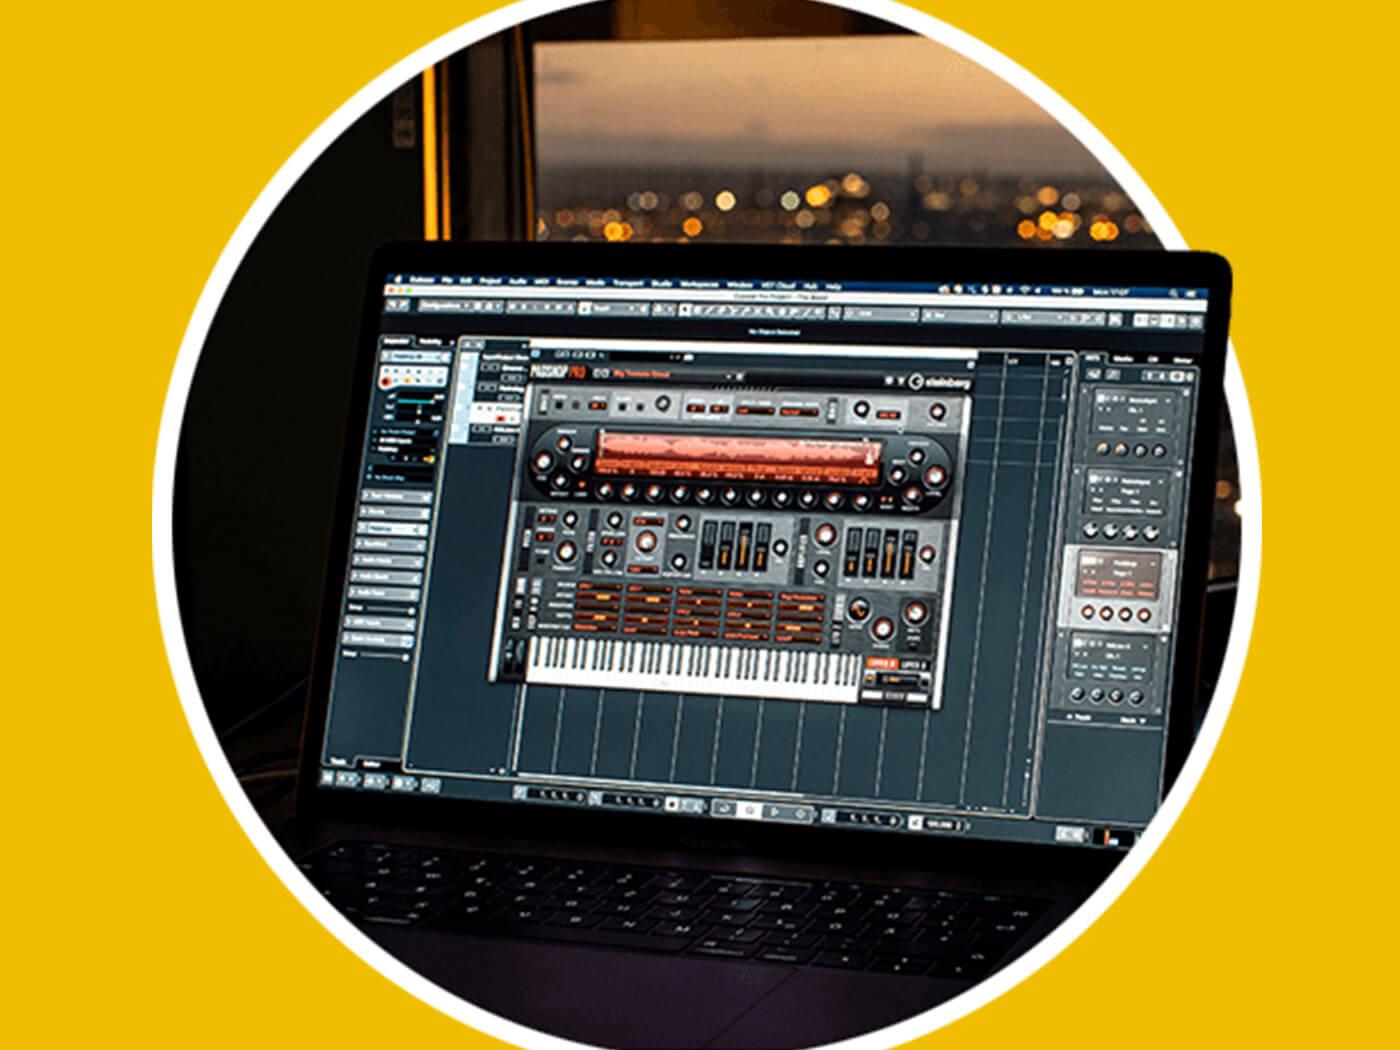 Buy Nektar controller and get free Steinberg granular synth plug-in